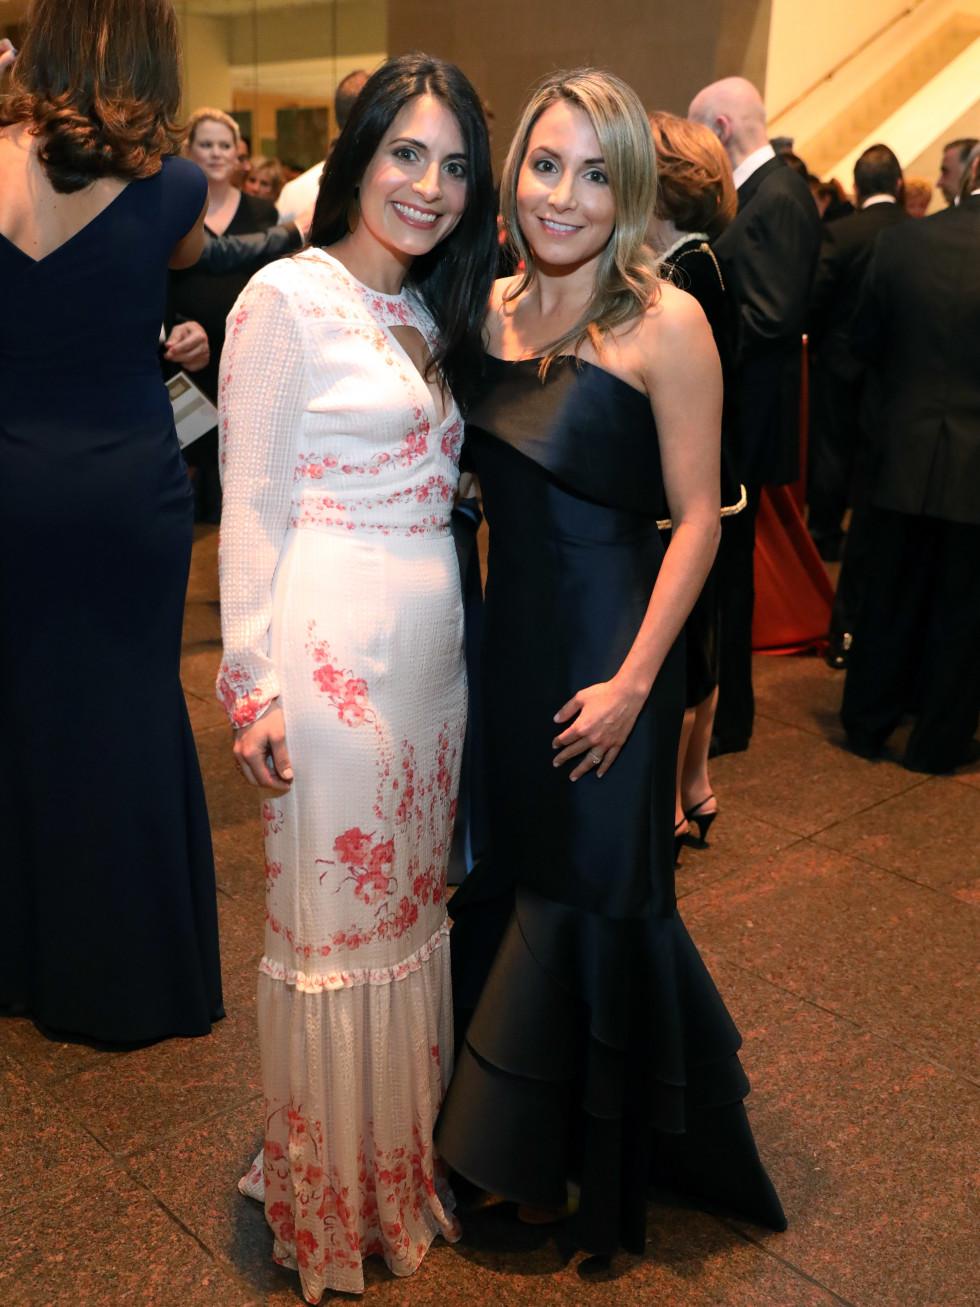 Houston, MFAH Art of the Islamic Worlds Gala, November 2017, Elizabeth Esfahani, Sarah Tringhese